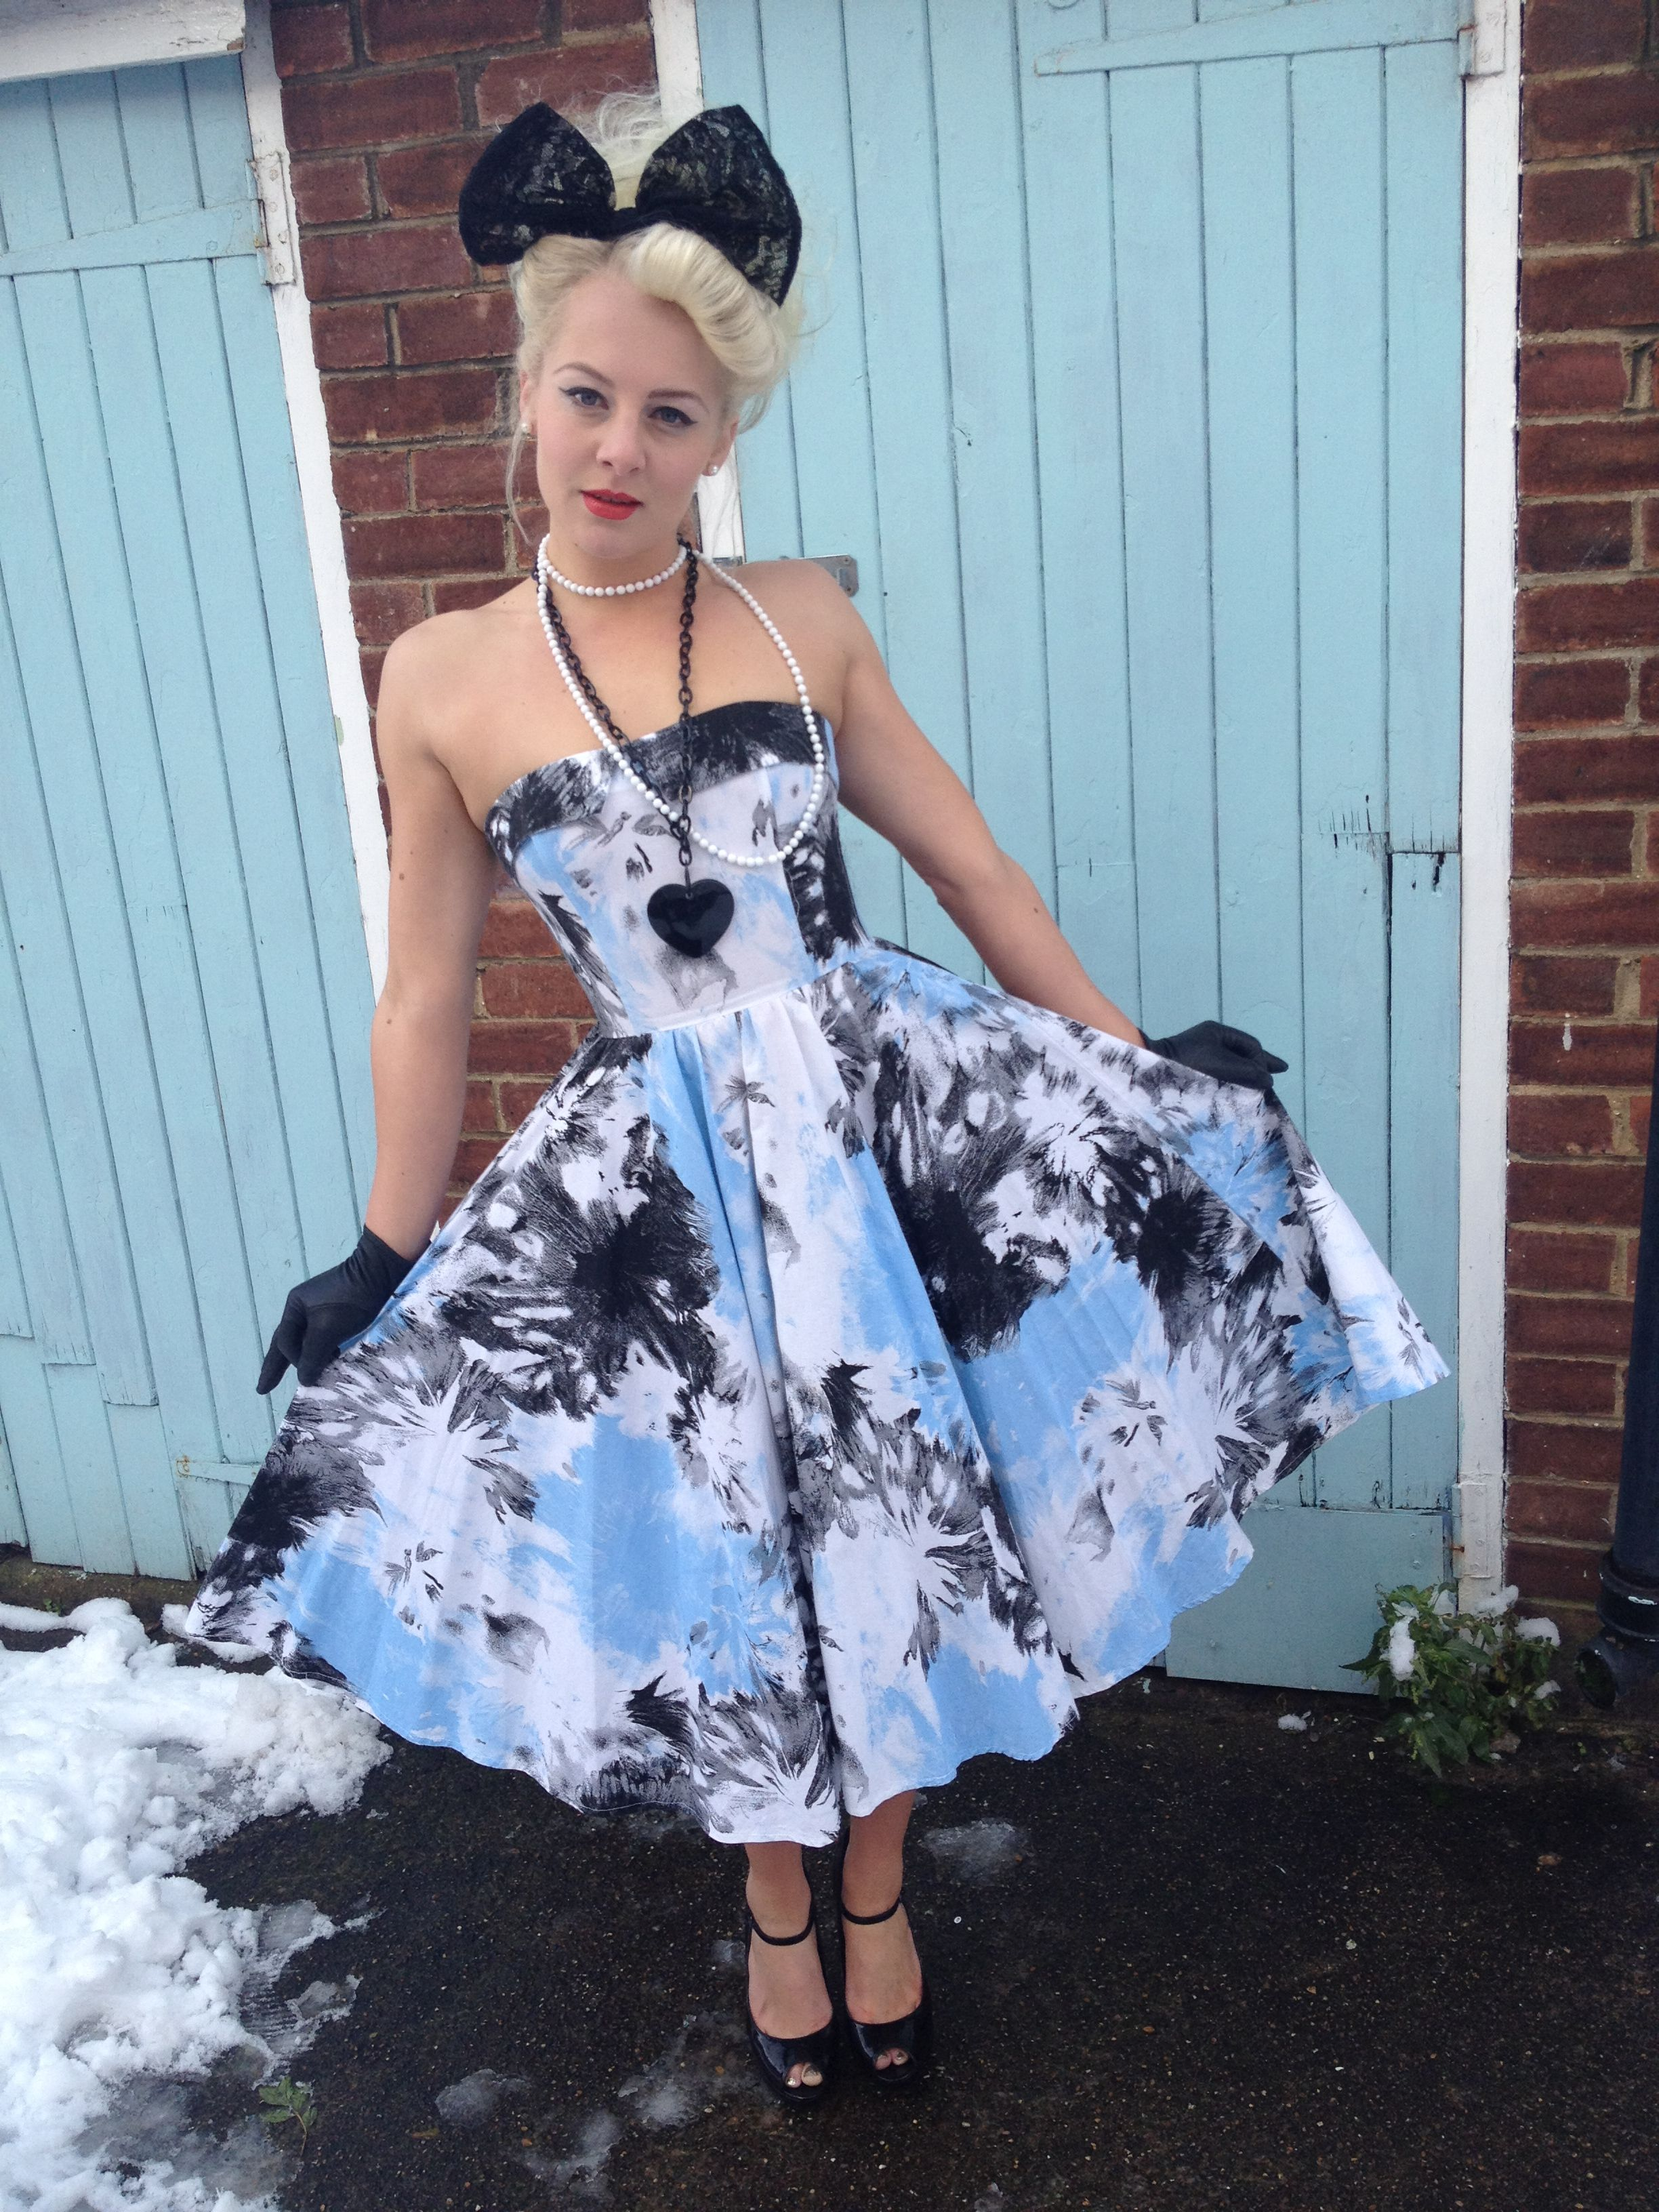 Gorgeous 80 S Prom Dress 80s Prom Dress Prom Costume Dress 80s Style [ 3264 x 2448 Pixel ]